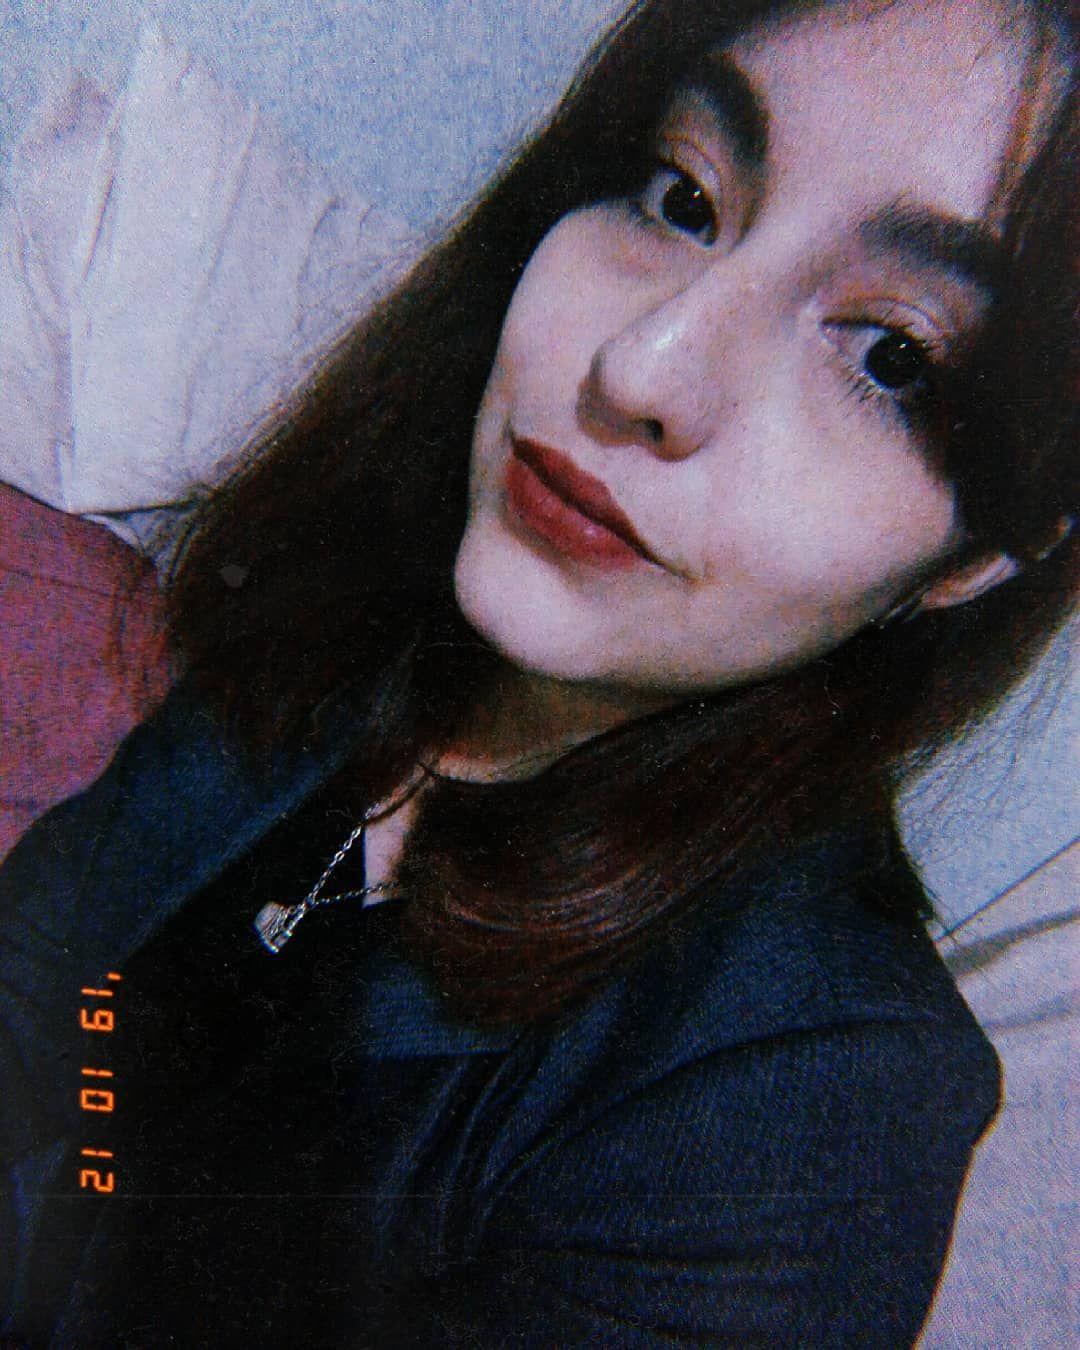 Les Digo Que El Flequillo Mal Cortado Por Mi Esta De Moda Selfie Me Fridaynight Cinema Huji Hujicam Vsc Vsco Vs Instagram Posts Instagram Image